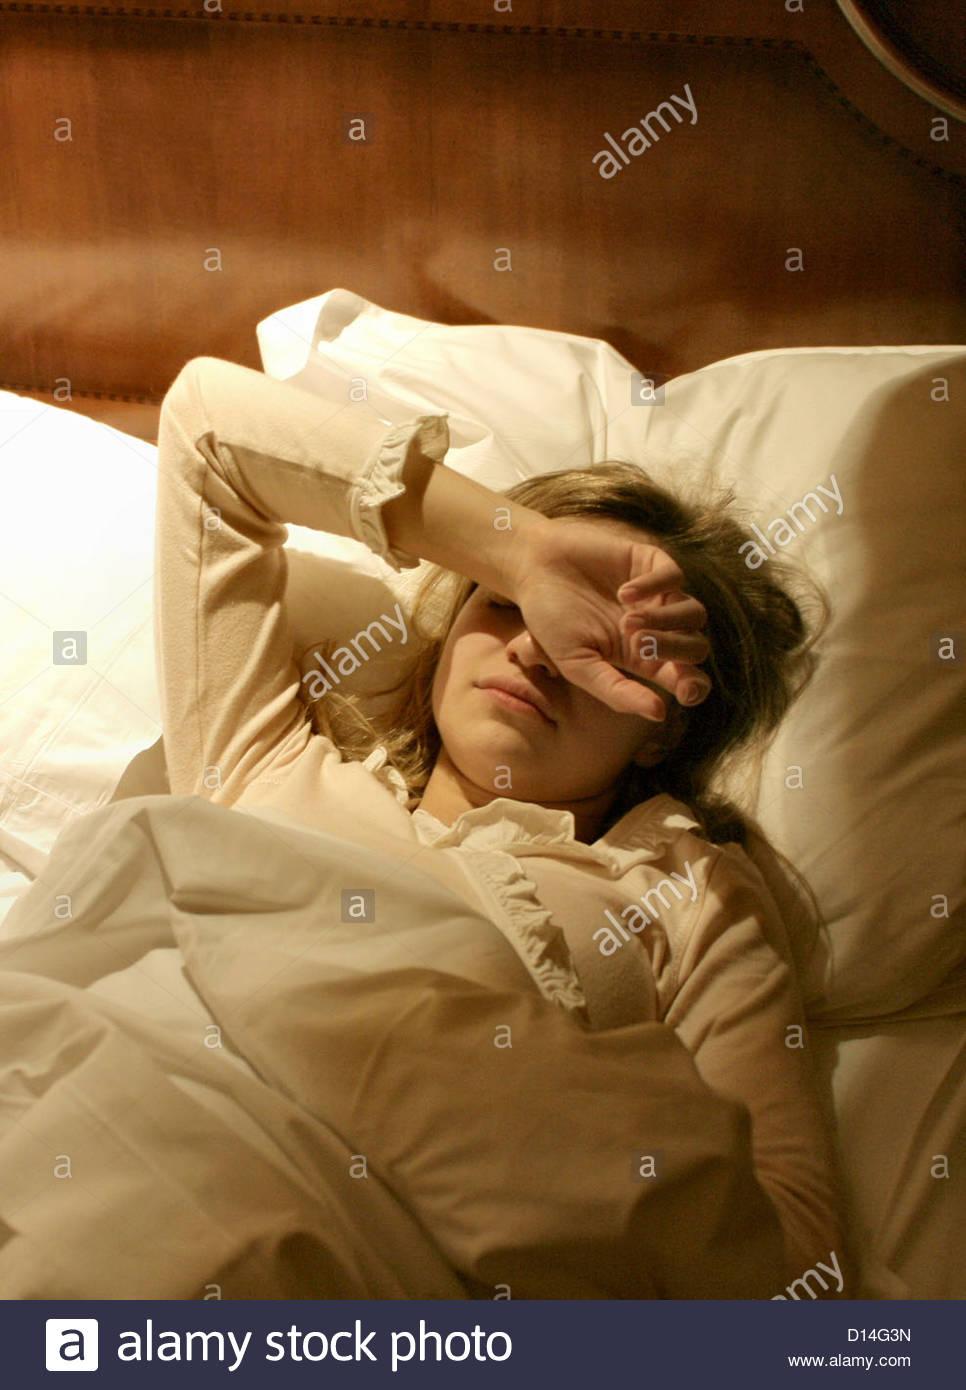 Frau im Bett zu erwachen Stockbild